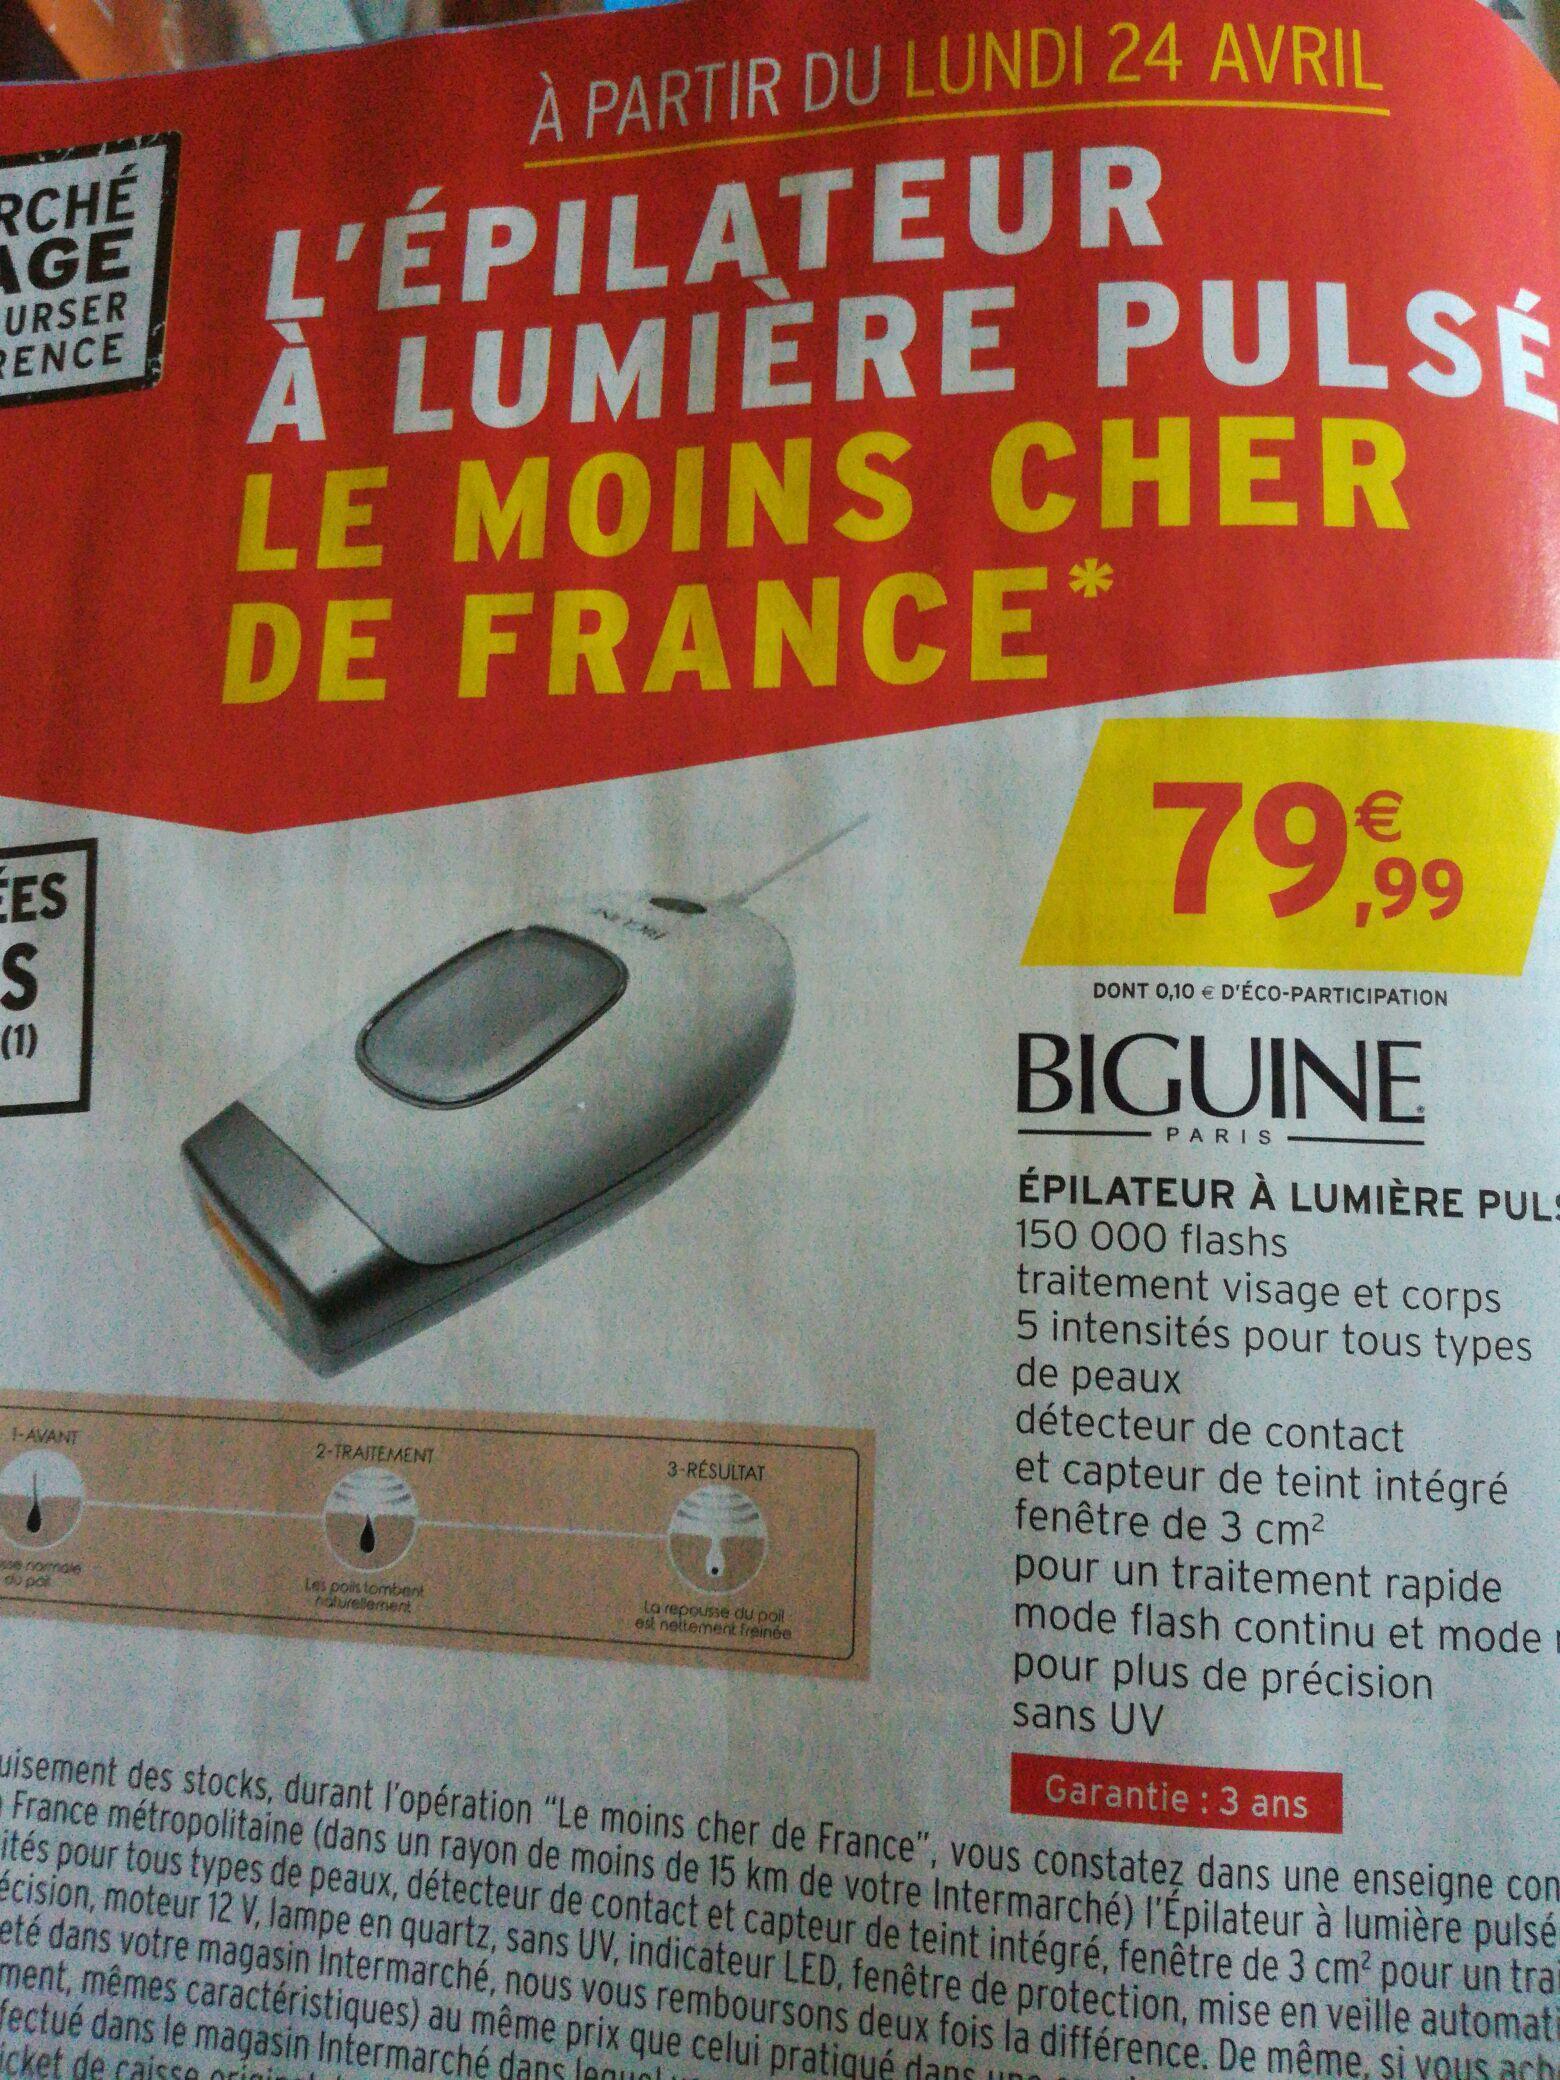 pilateur lumi re puls e biguine. Black Bedroom Furniture Sets. Home Design Ideas